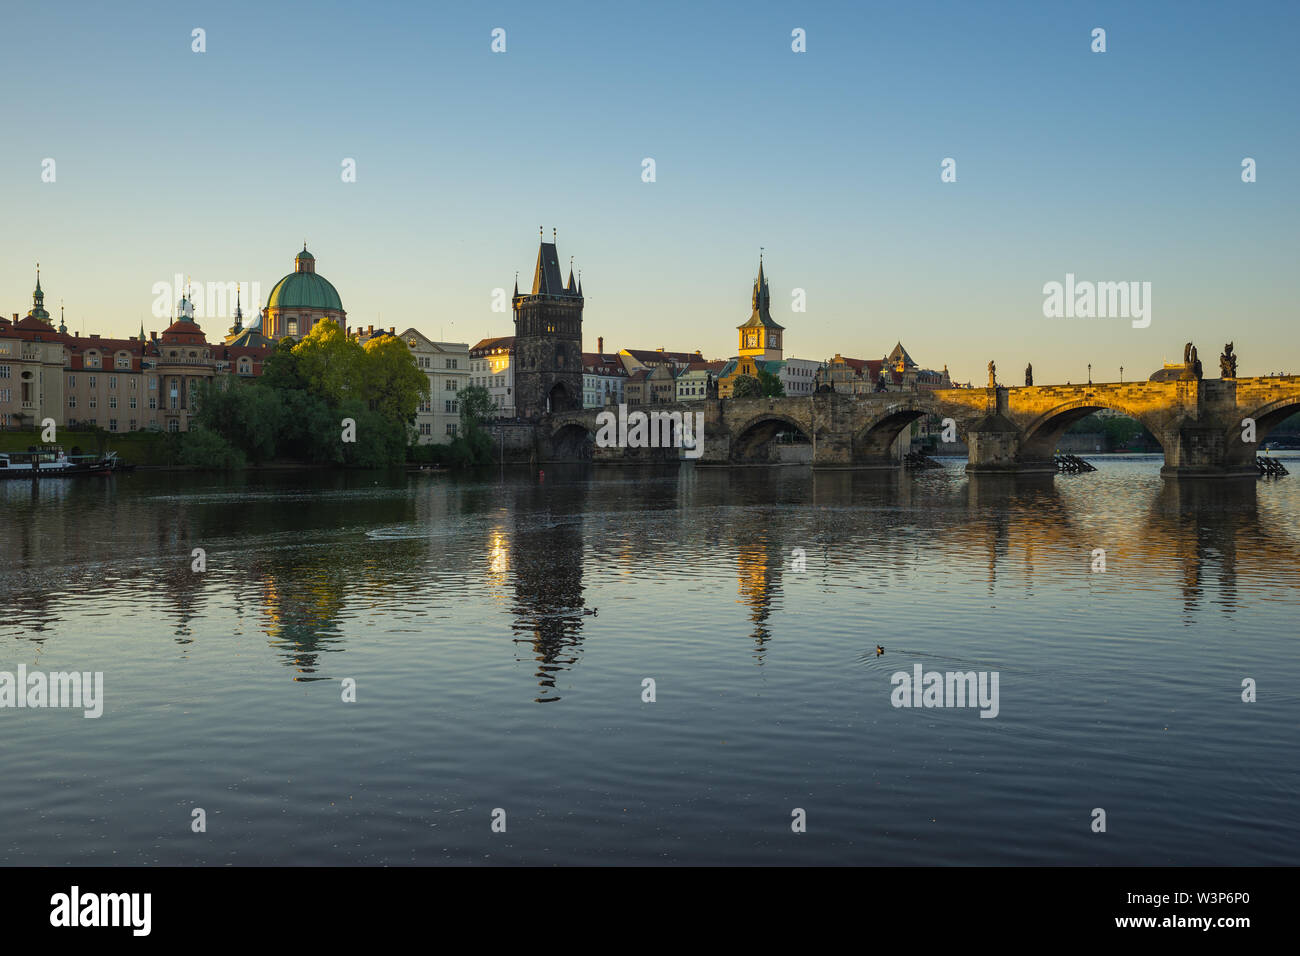 Prague city skyline with Charles Bridge in Czech Republic. - Stock Image